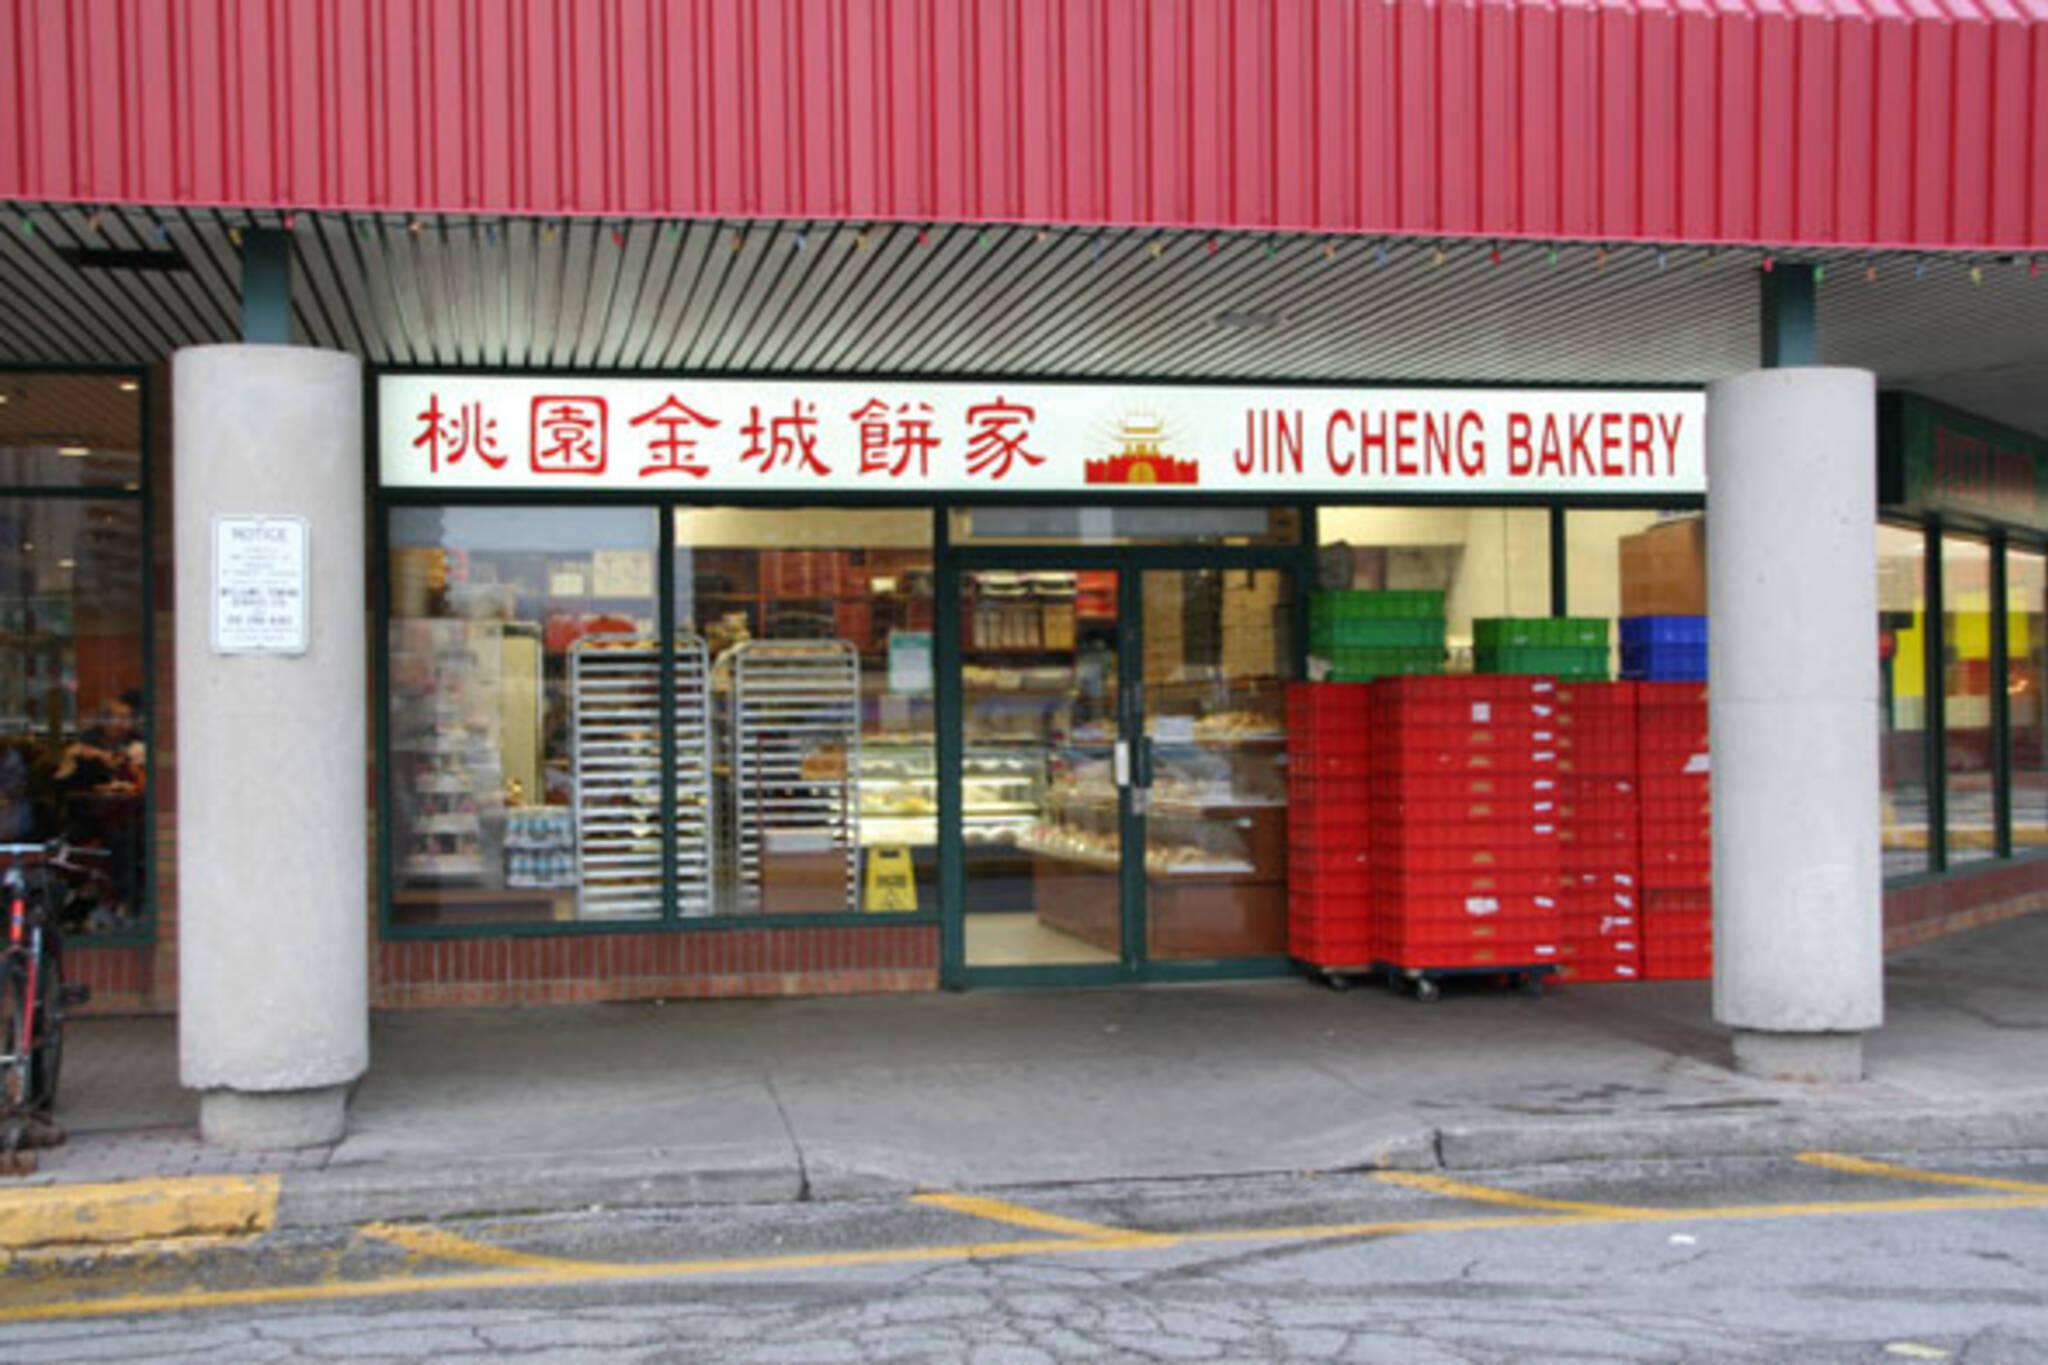 Jin Cheng Bakery